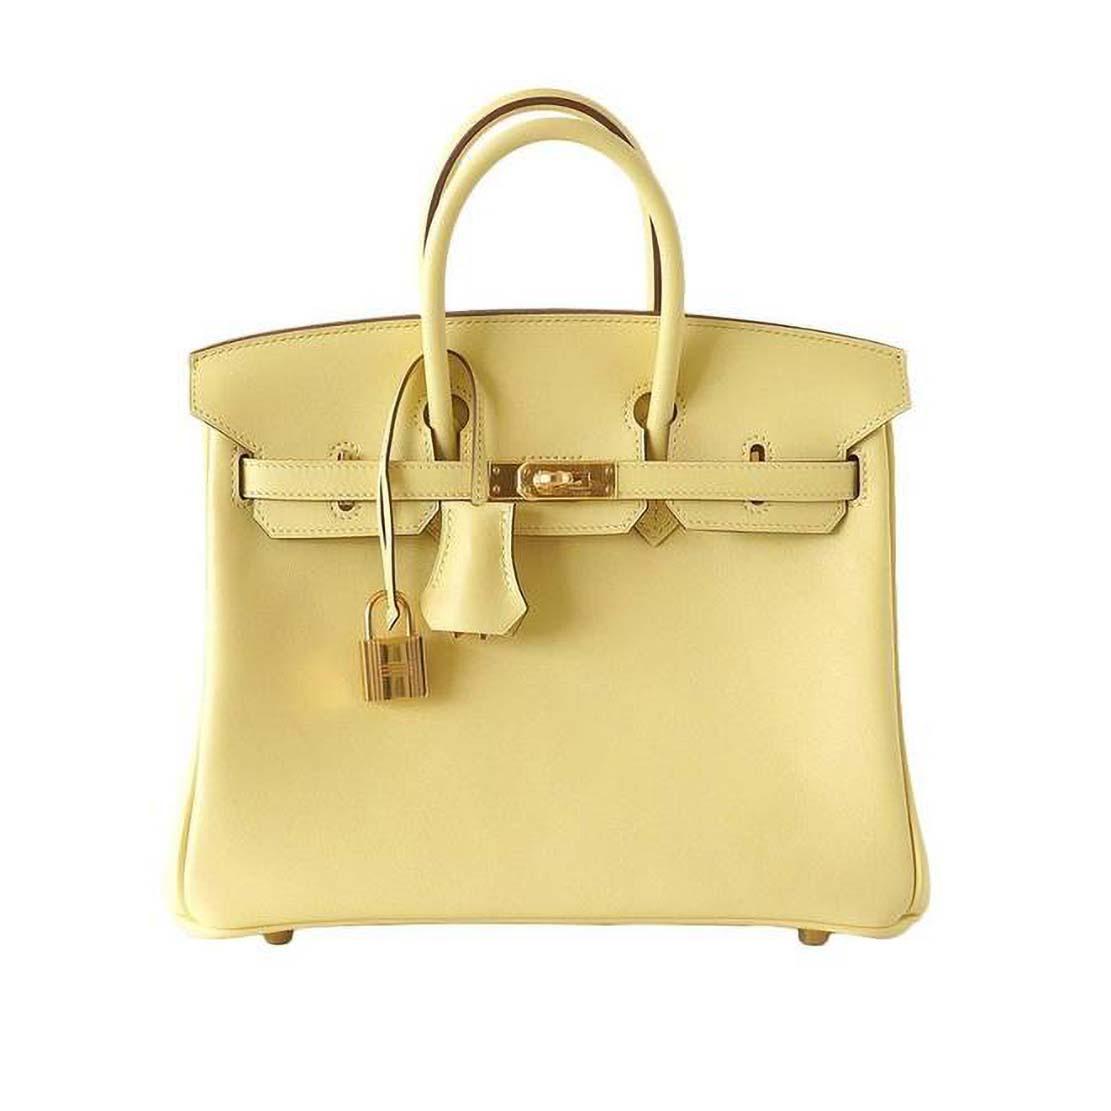 Hermes Birkin 25 Bag in Togo Leather with Gold Hardware